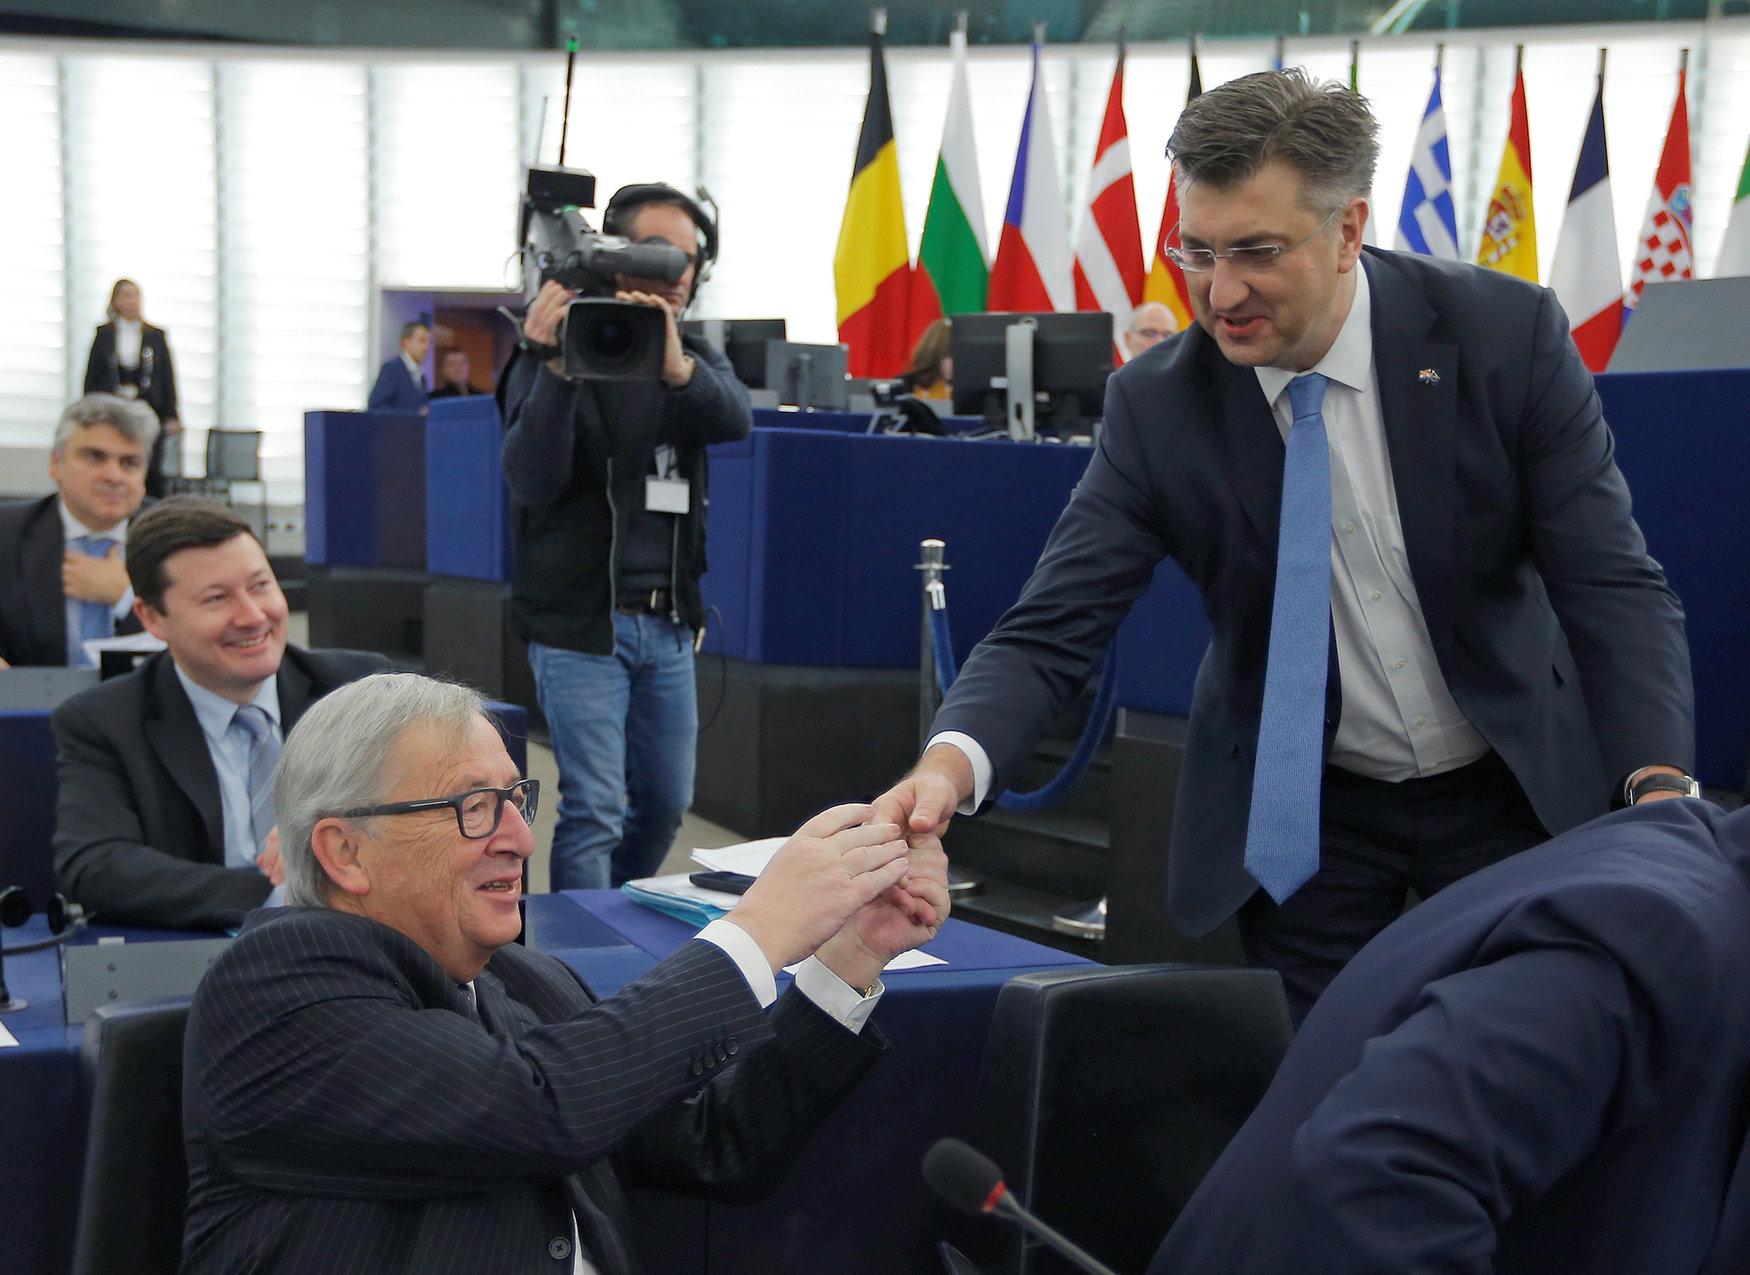 Hrvatski premijer Andrej Plenković i predsjednik Europske komisije Jean-Claude Juncker